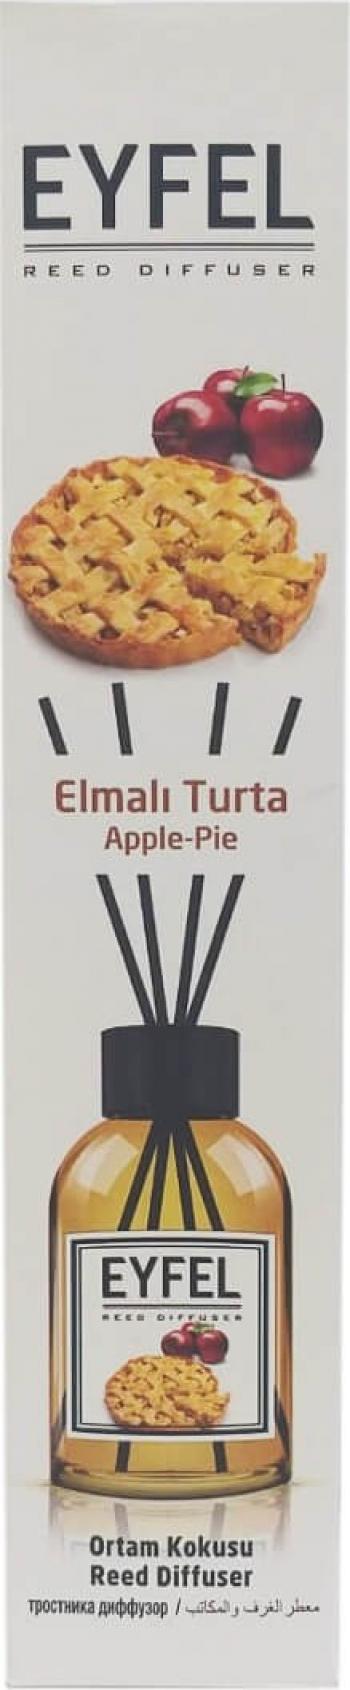 Odorizant de camera Eyfel - Betisoarele de ratan Reed Diffuser Apple Pie 110 ml Cadou Perfect Inclus Odorizante